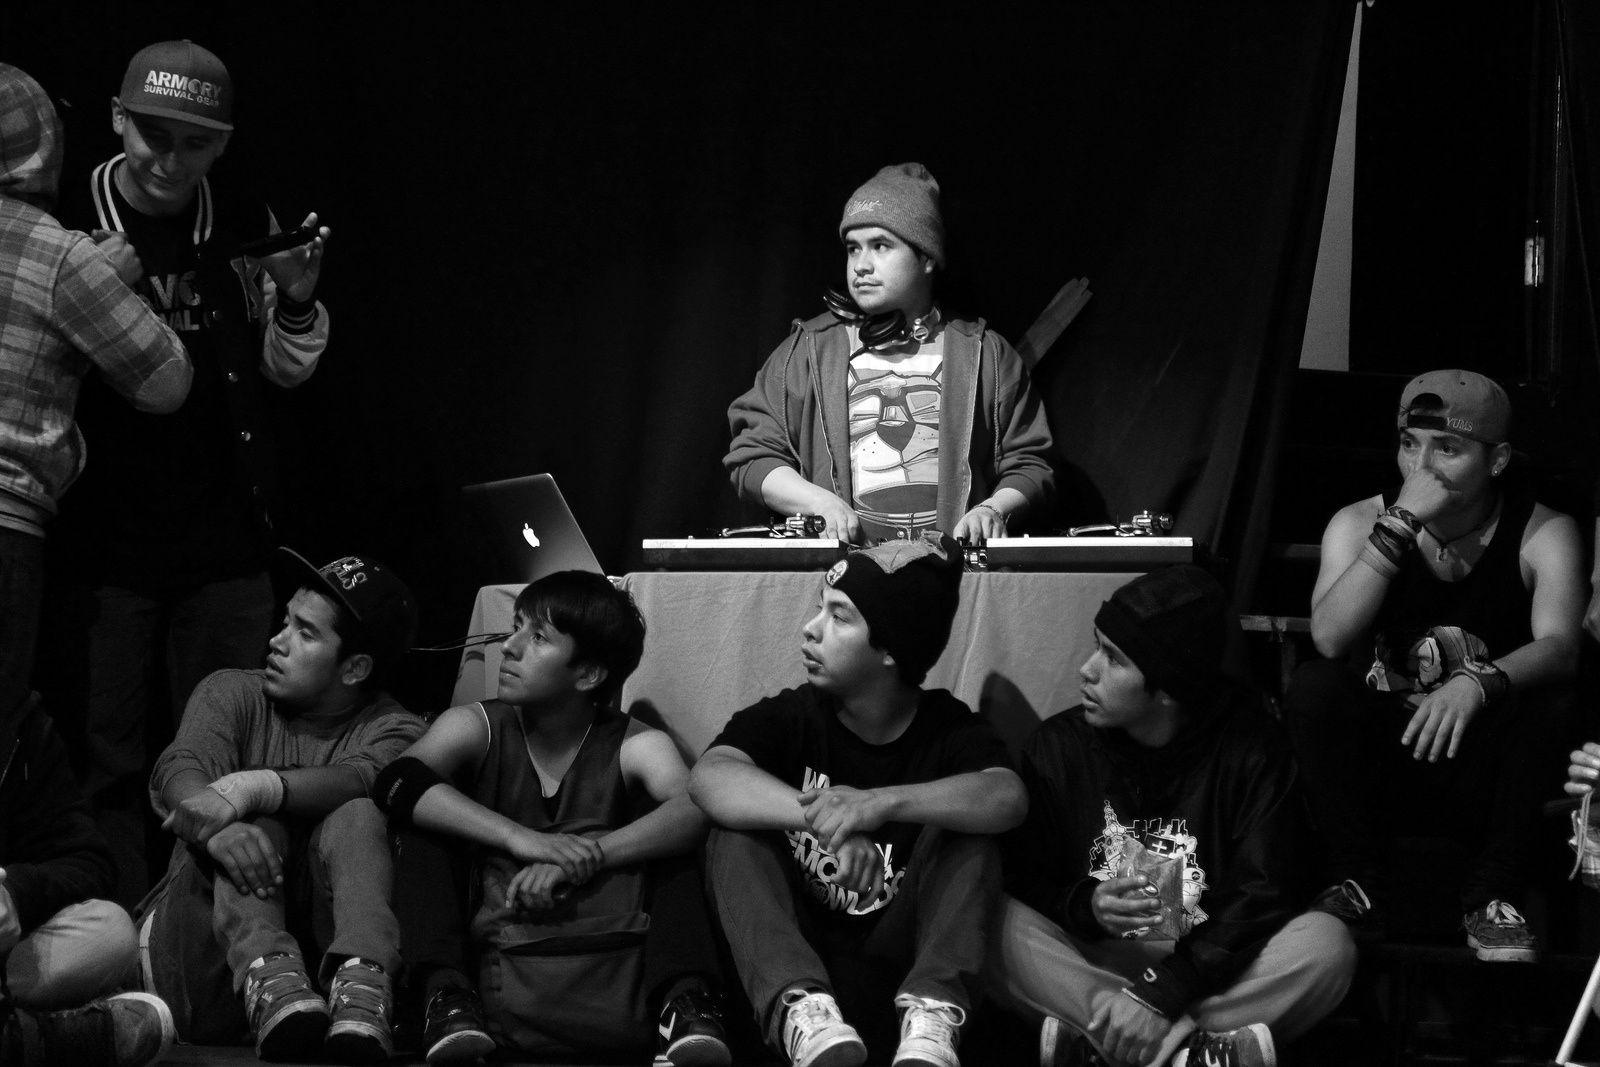 REVOLUTION - BreakDance Event 2014 - La Paz Bolivia